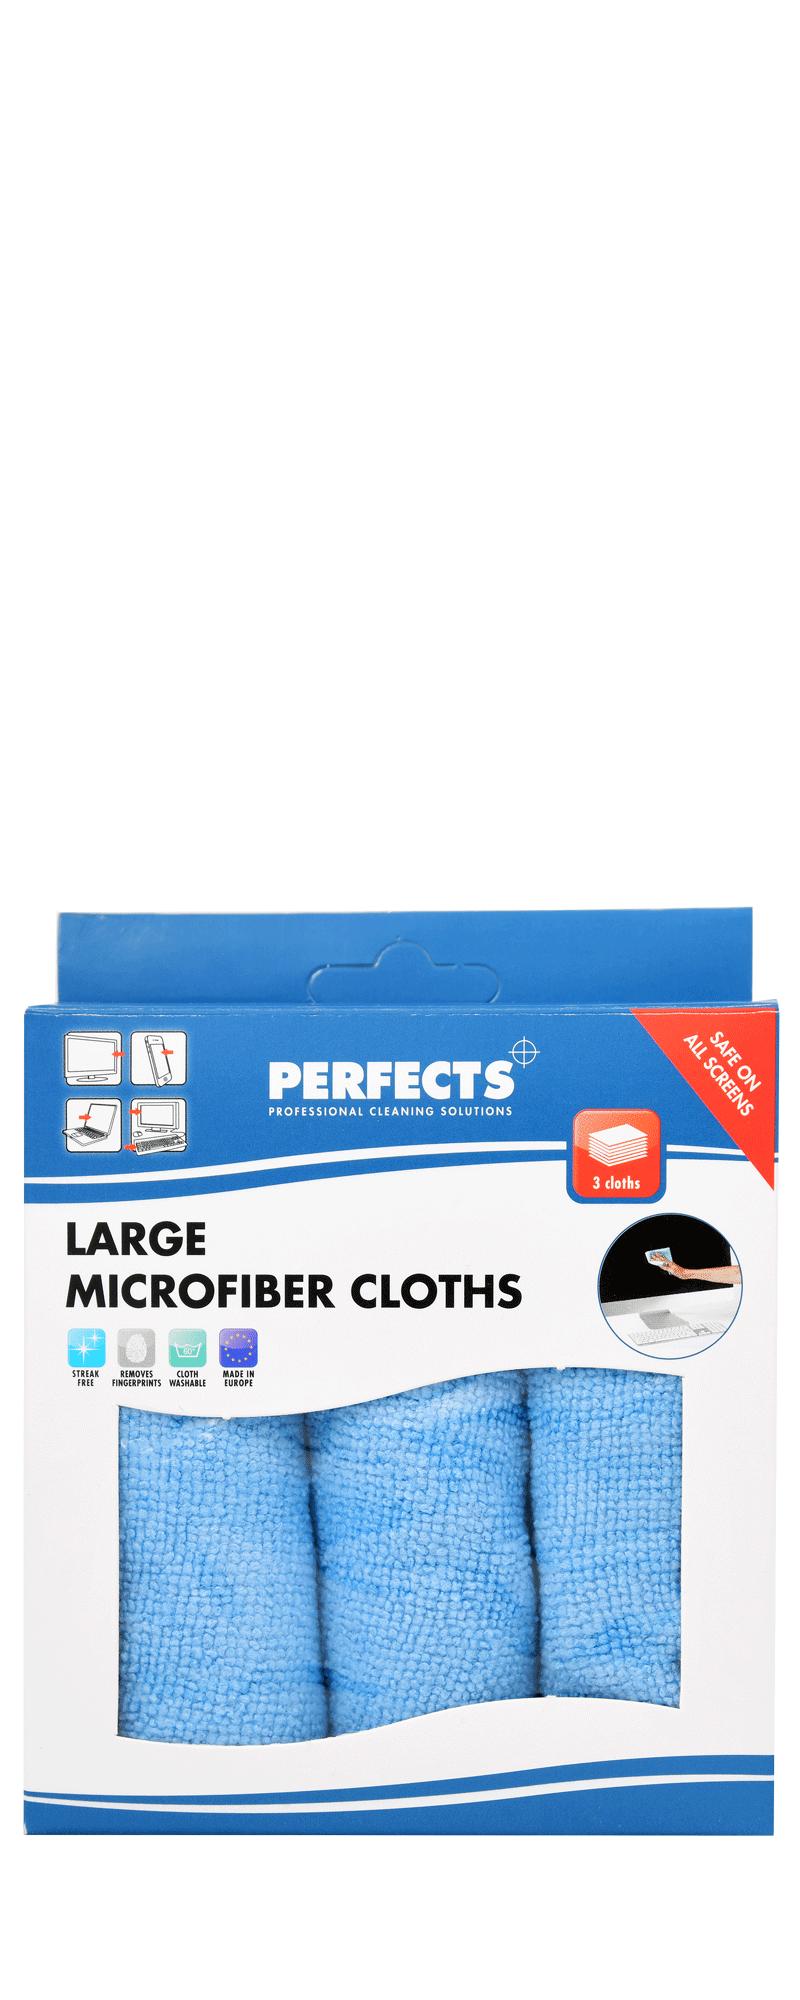 Large Microfiber Cloths